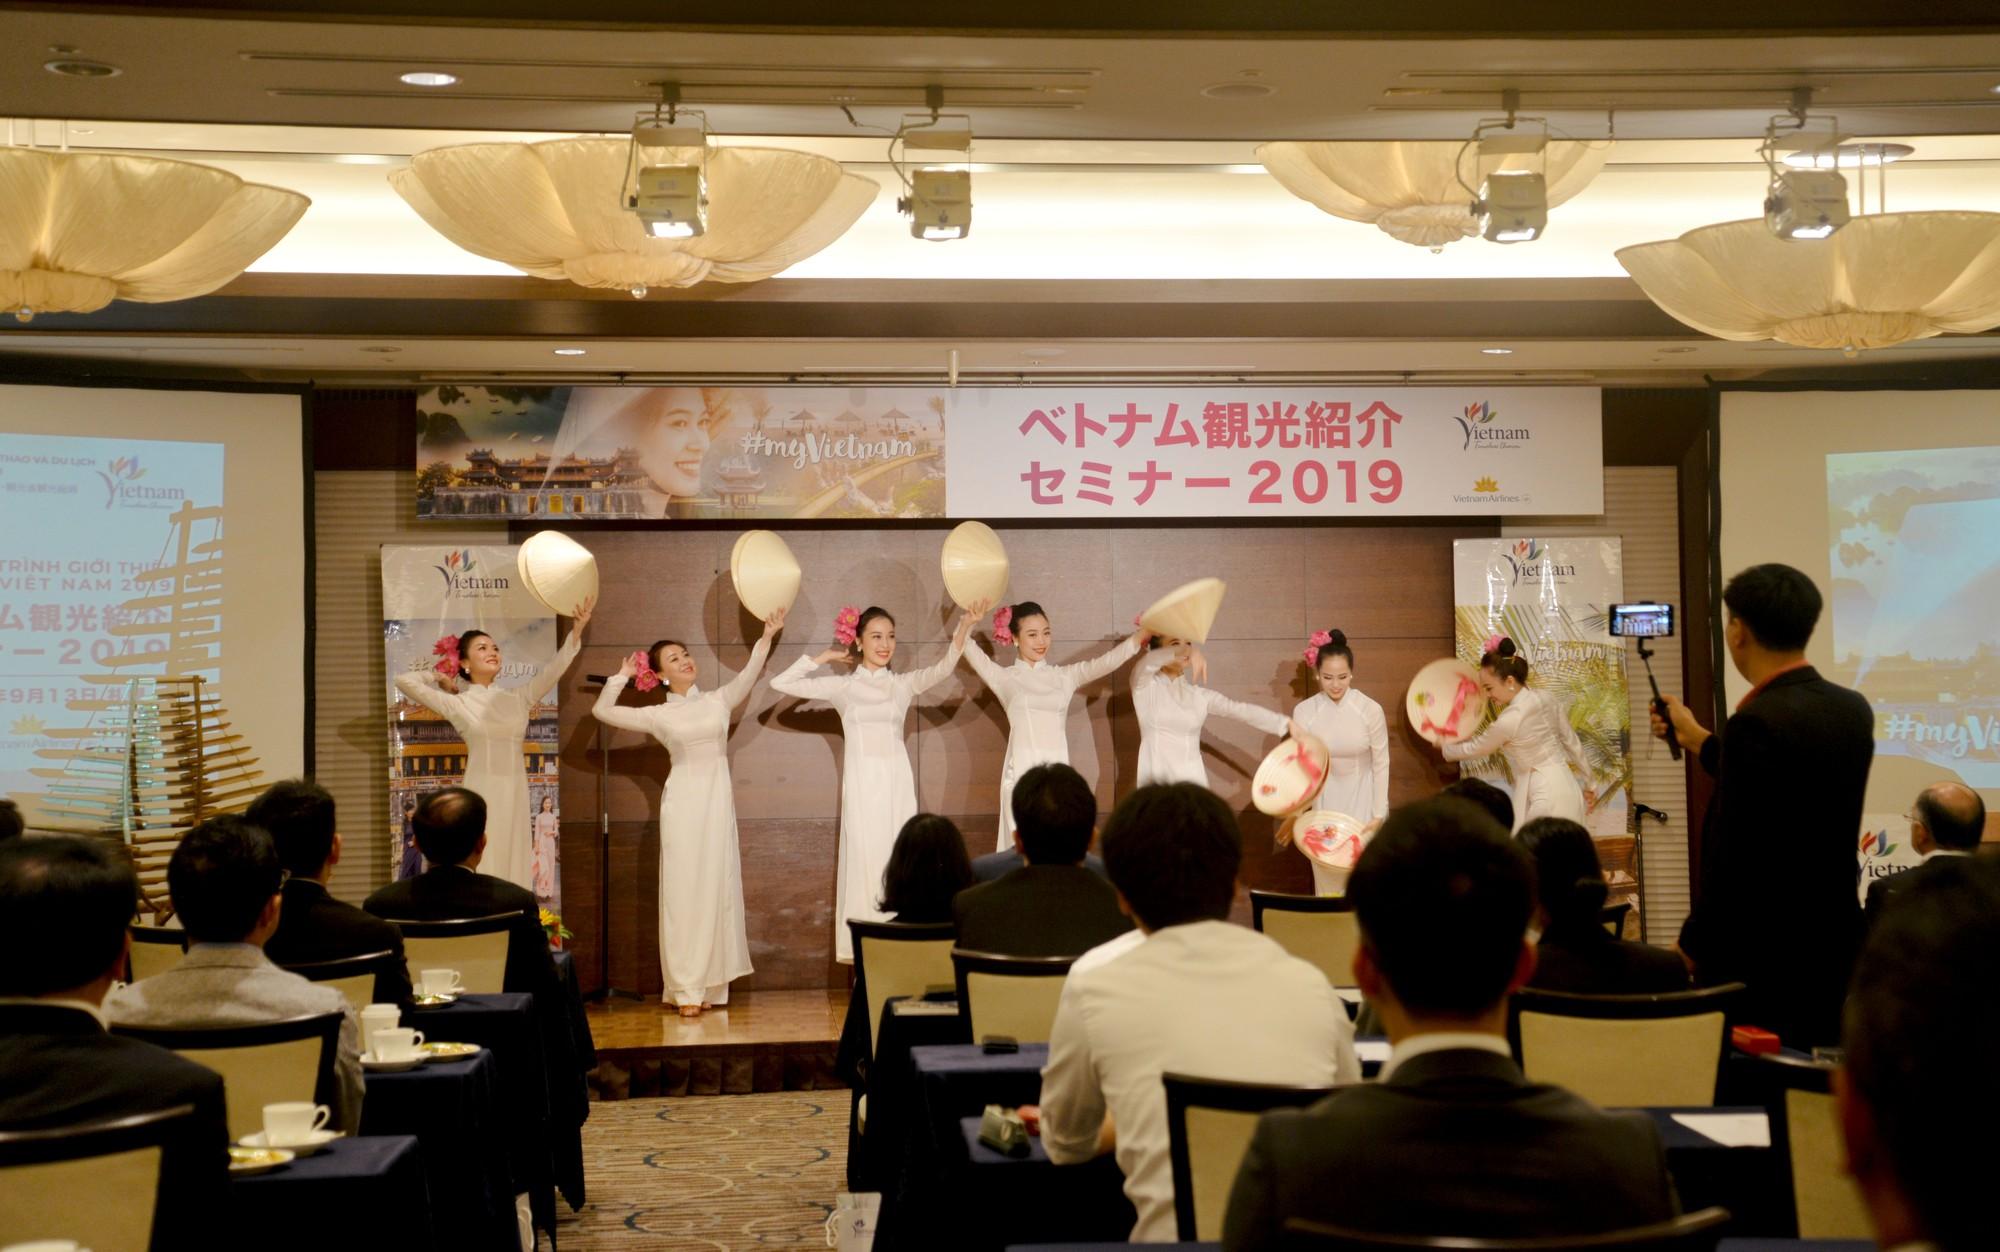 Giới thiệu Du lịch Việt Nam tại Sapporo, tỉnh Hokkaido - Ảnh 8.